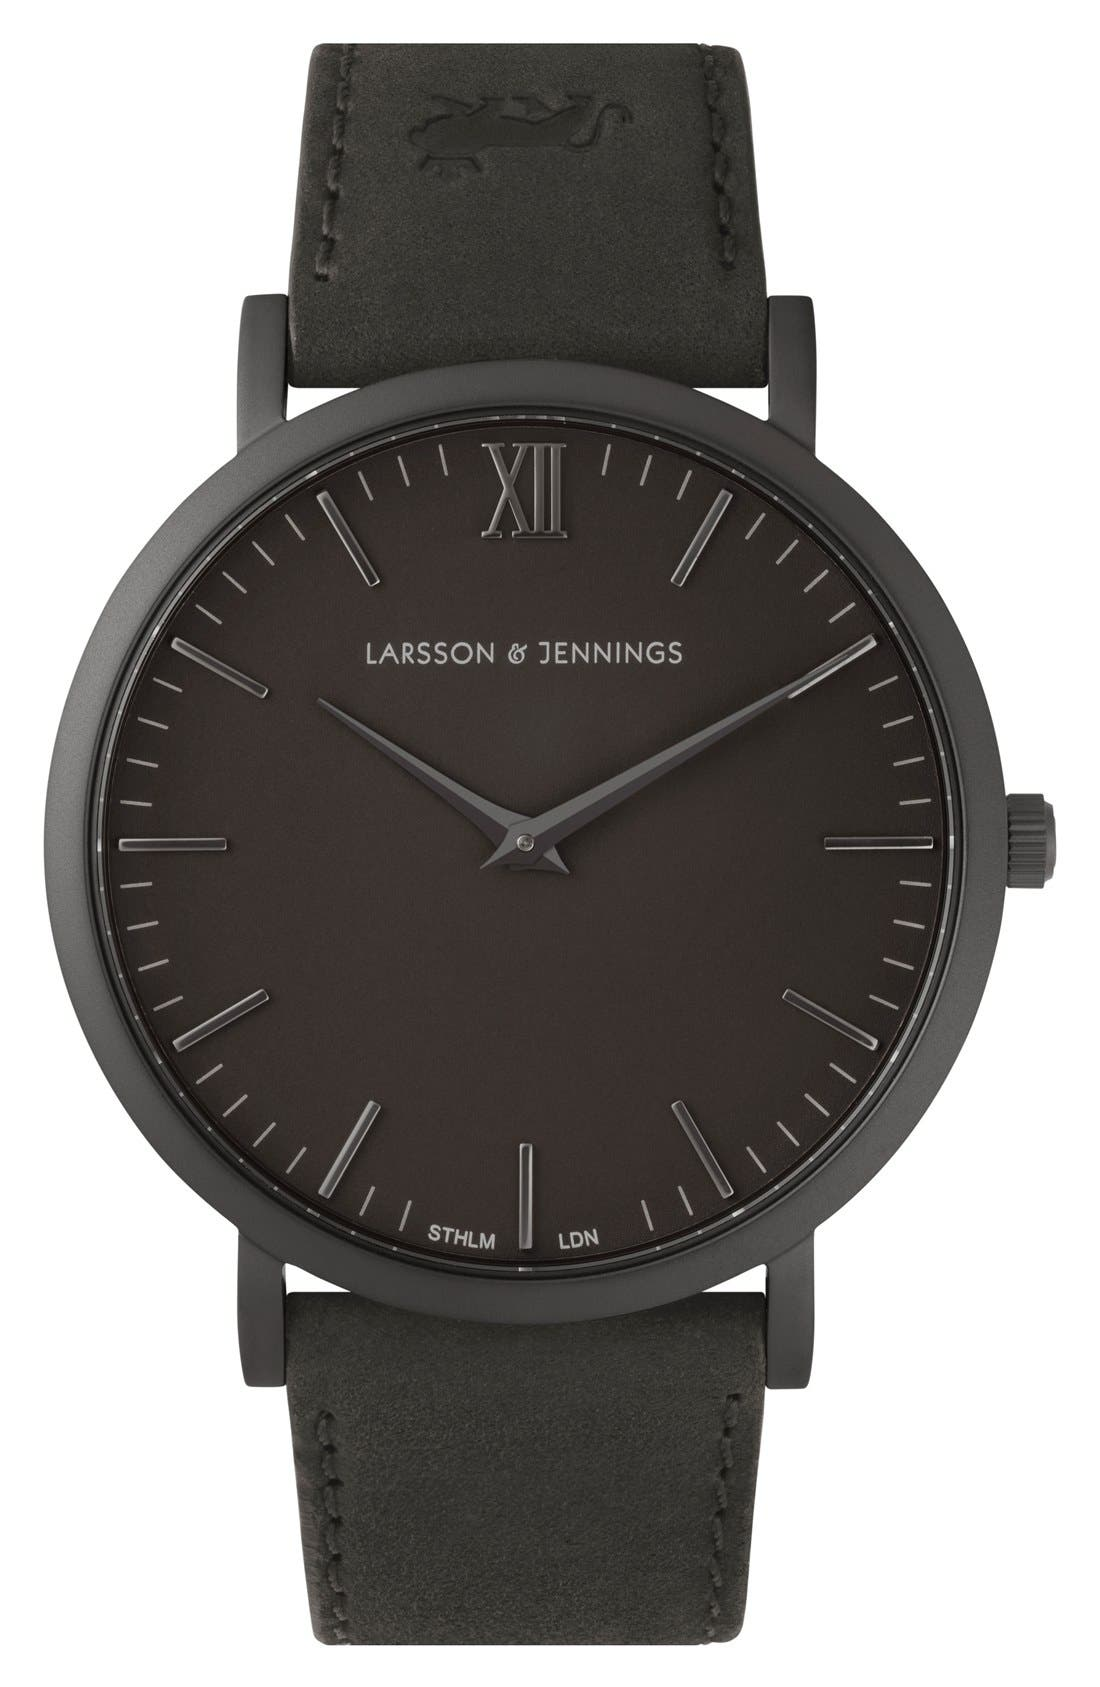 Main Image - Larsson & Jennings 'Lugano' Leather Strap Watch, 40mm